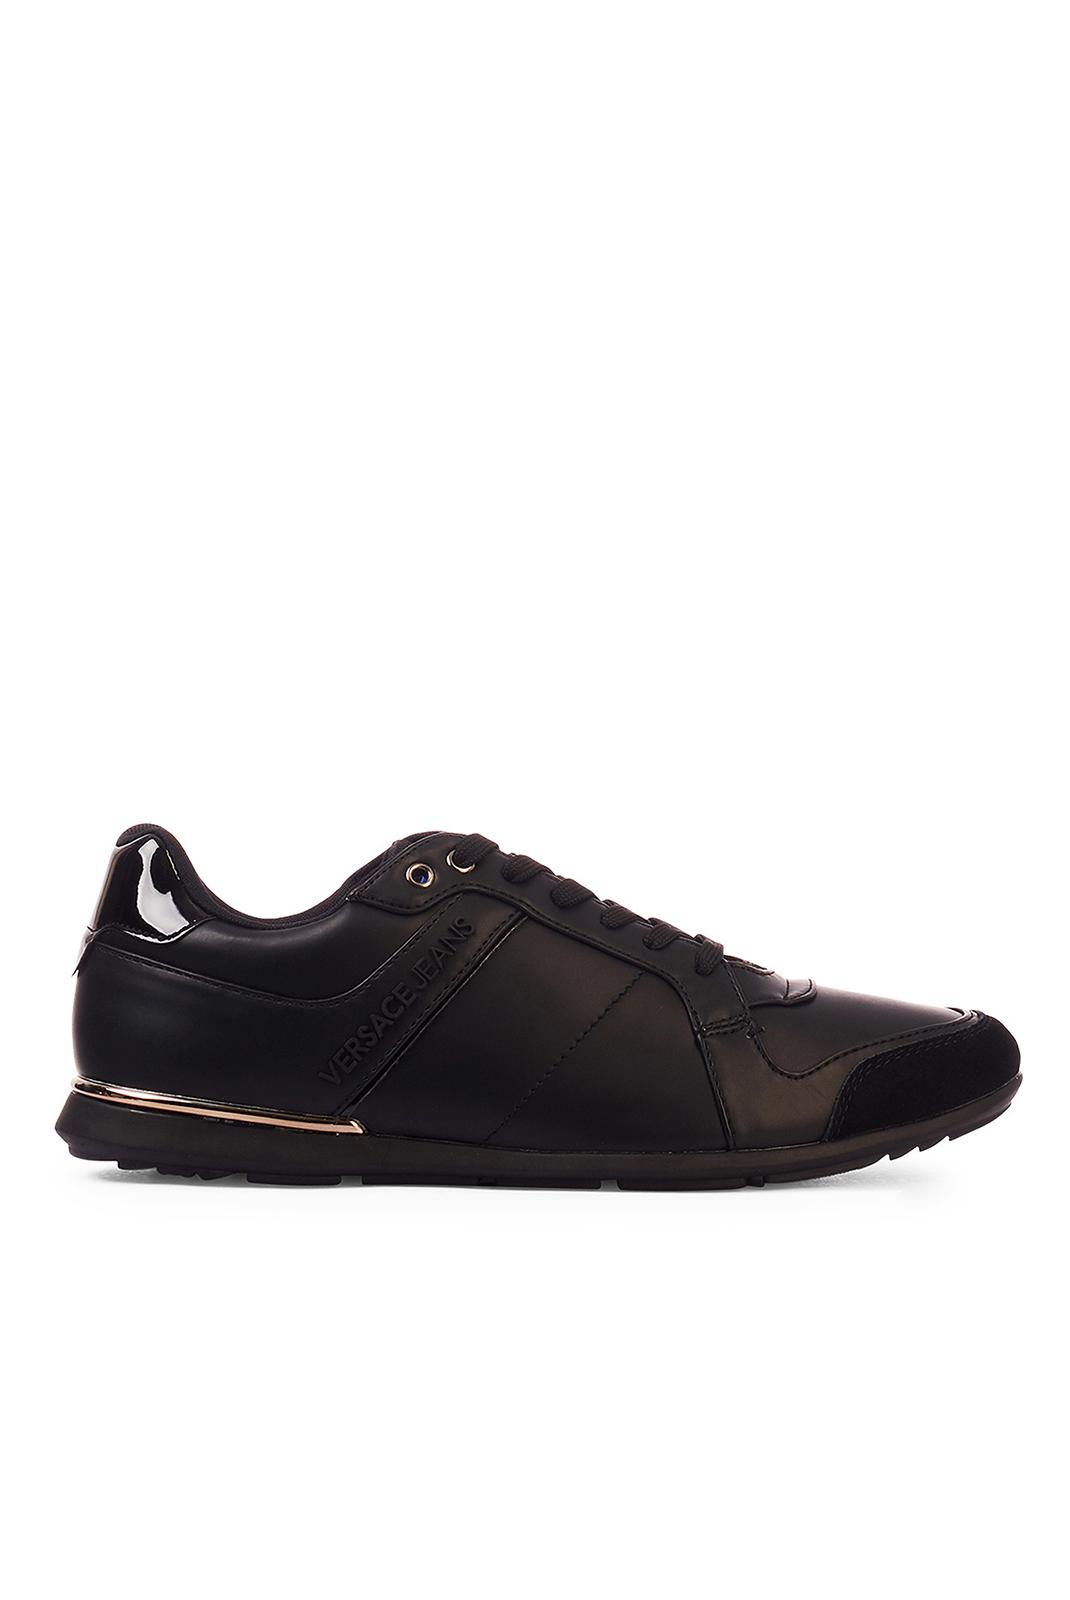 Baskets / Sport  Versace Jeans YSBSB1 899 black